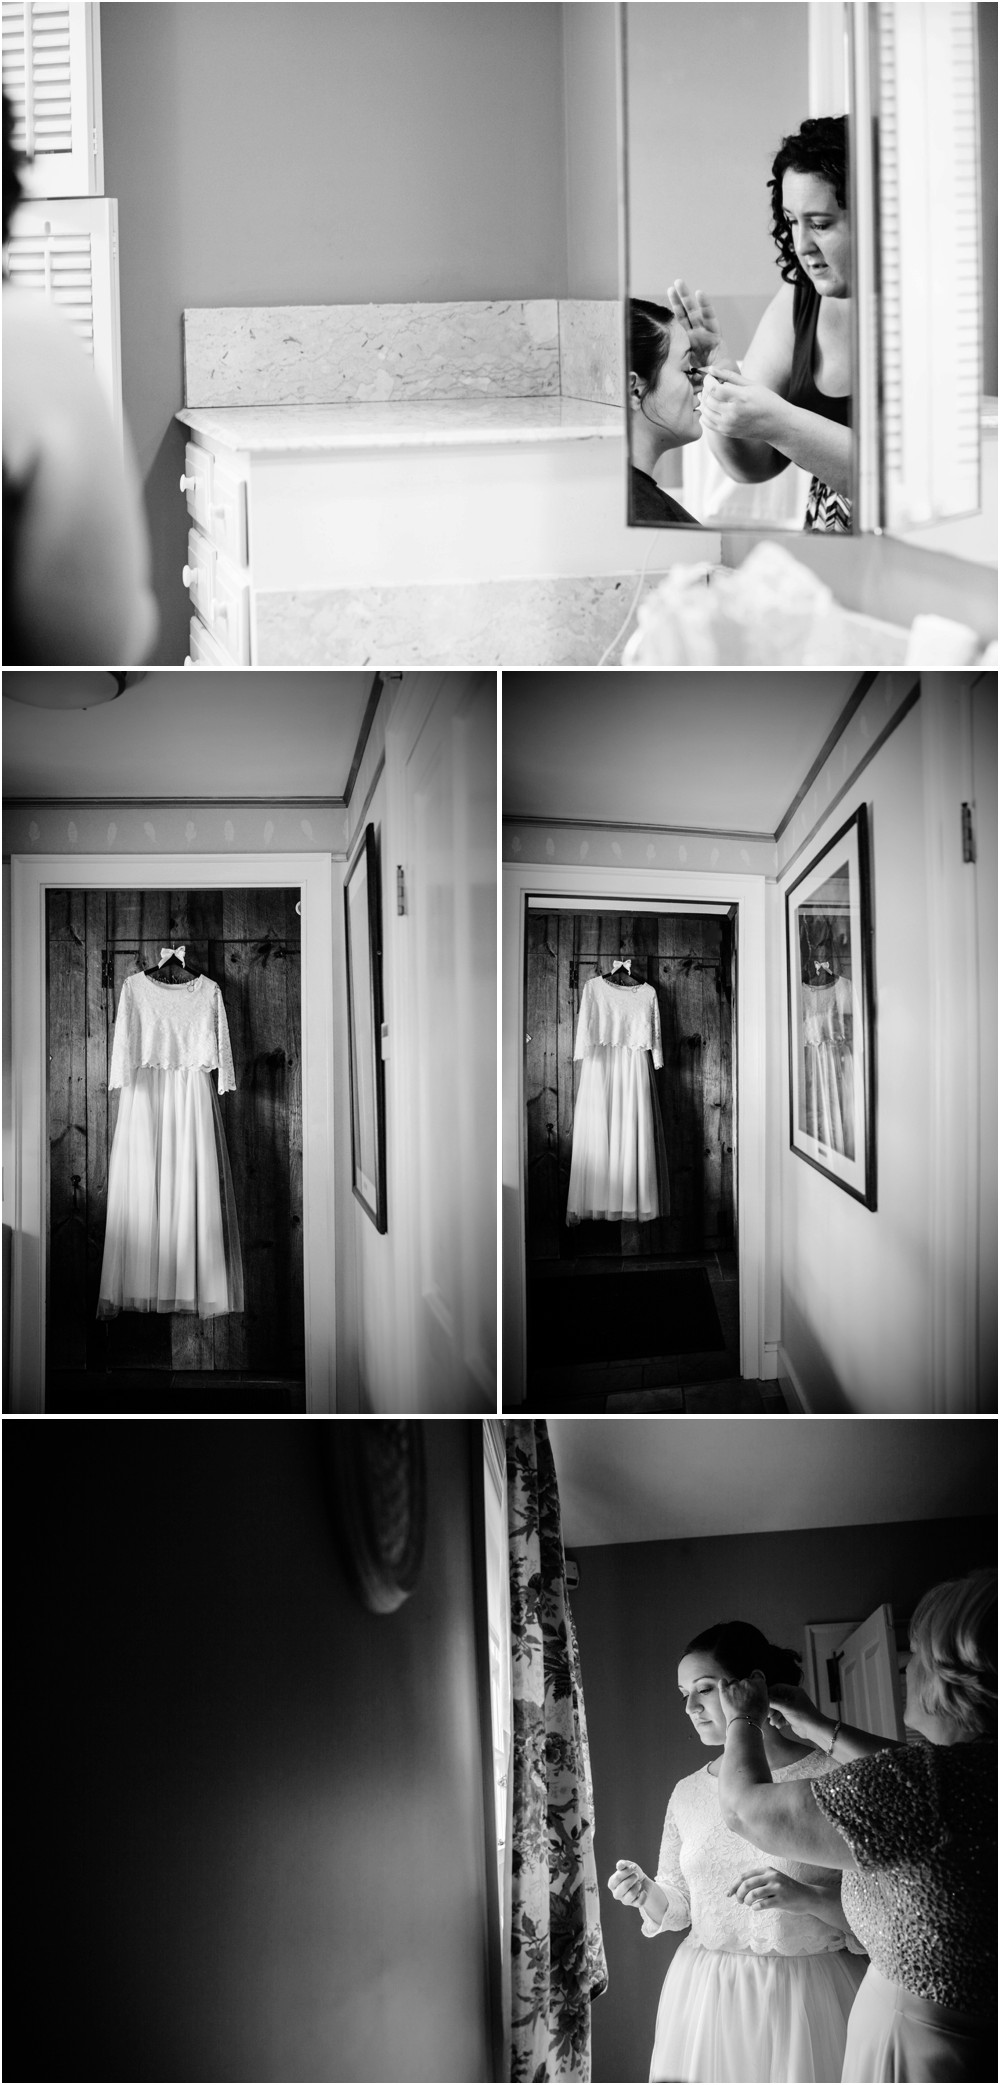 Lefebvre_Photography_2002.jpg